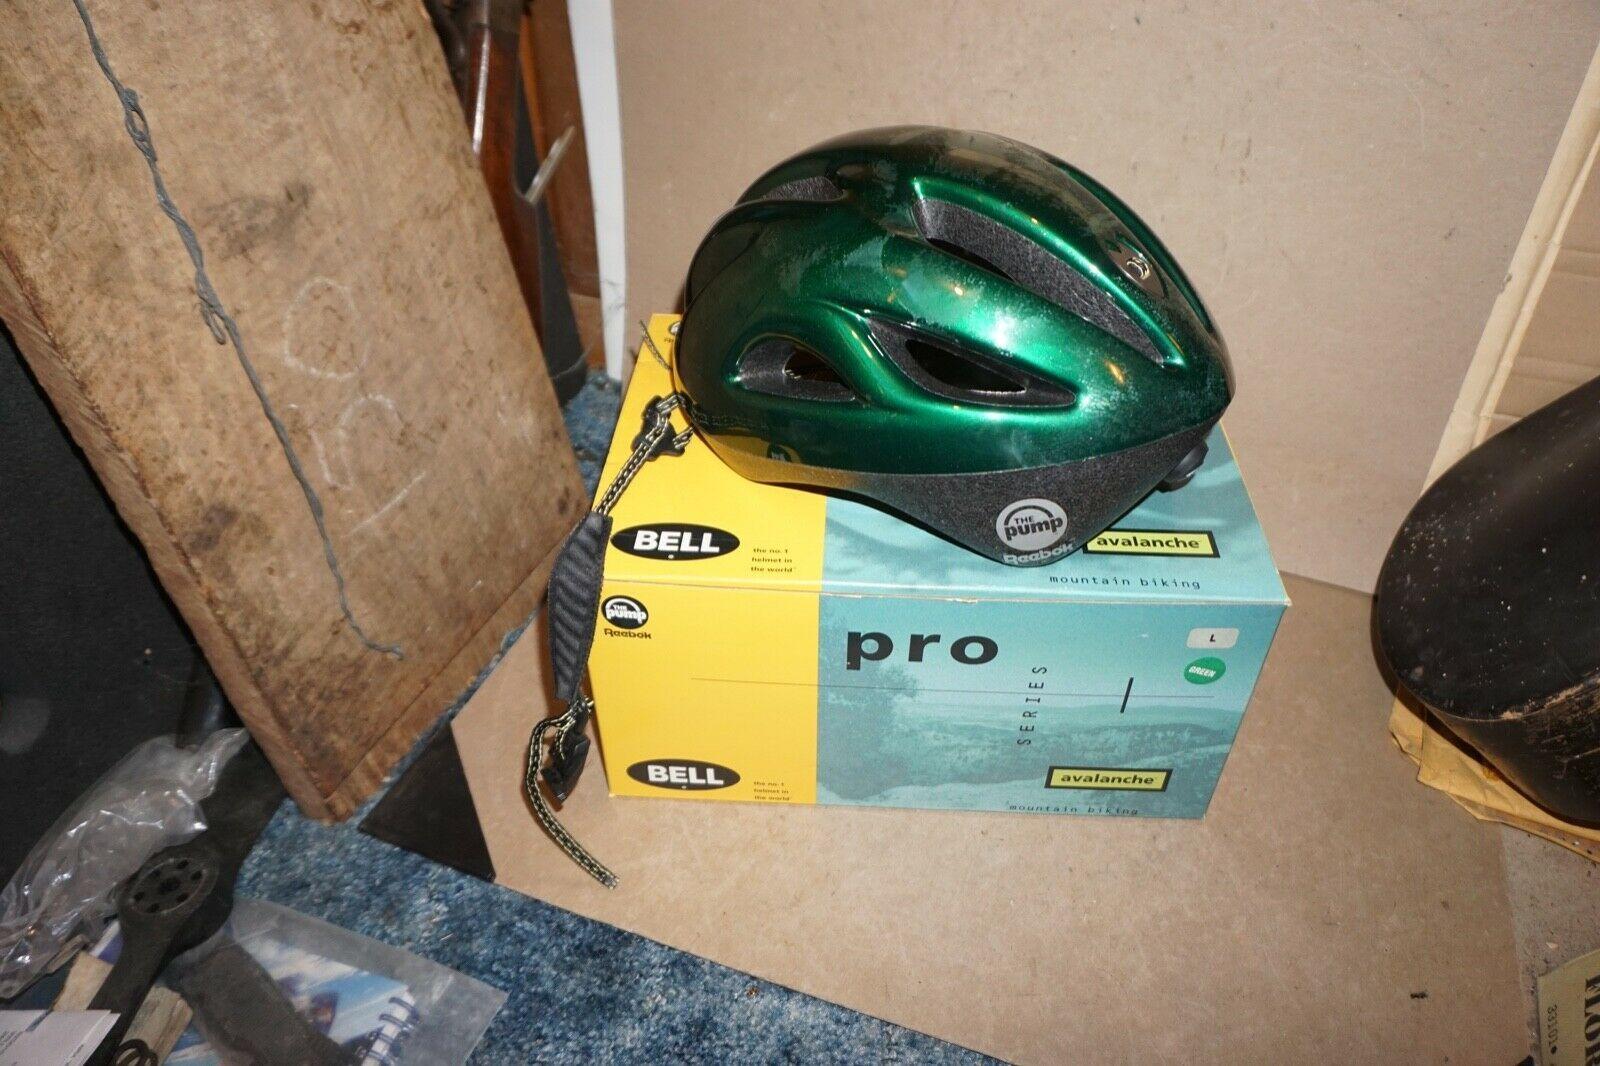 Used Bell Avalanche Reebok Pump Pro Mountain Bike Helmet Green